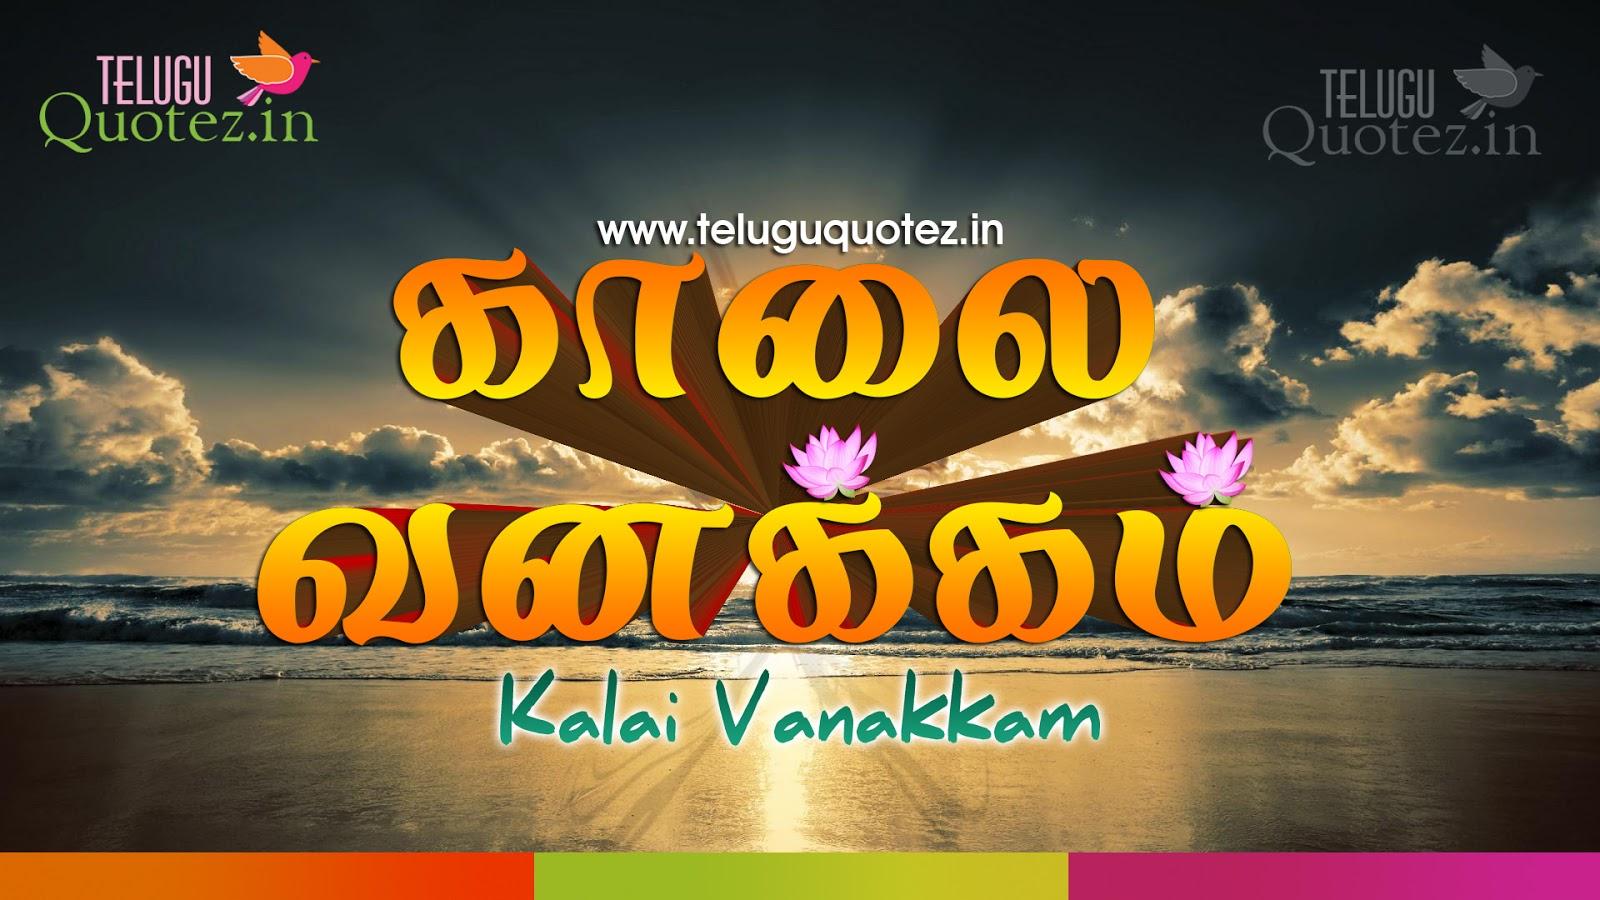 Kalai Vanakkam Tamil Good Morning Greetings Teluguquotez